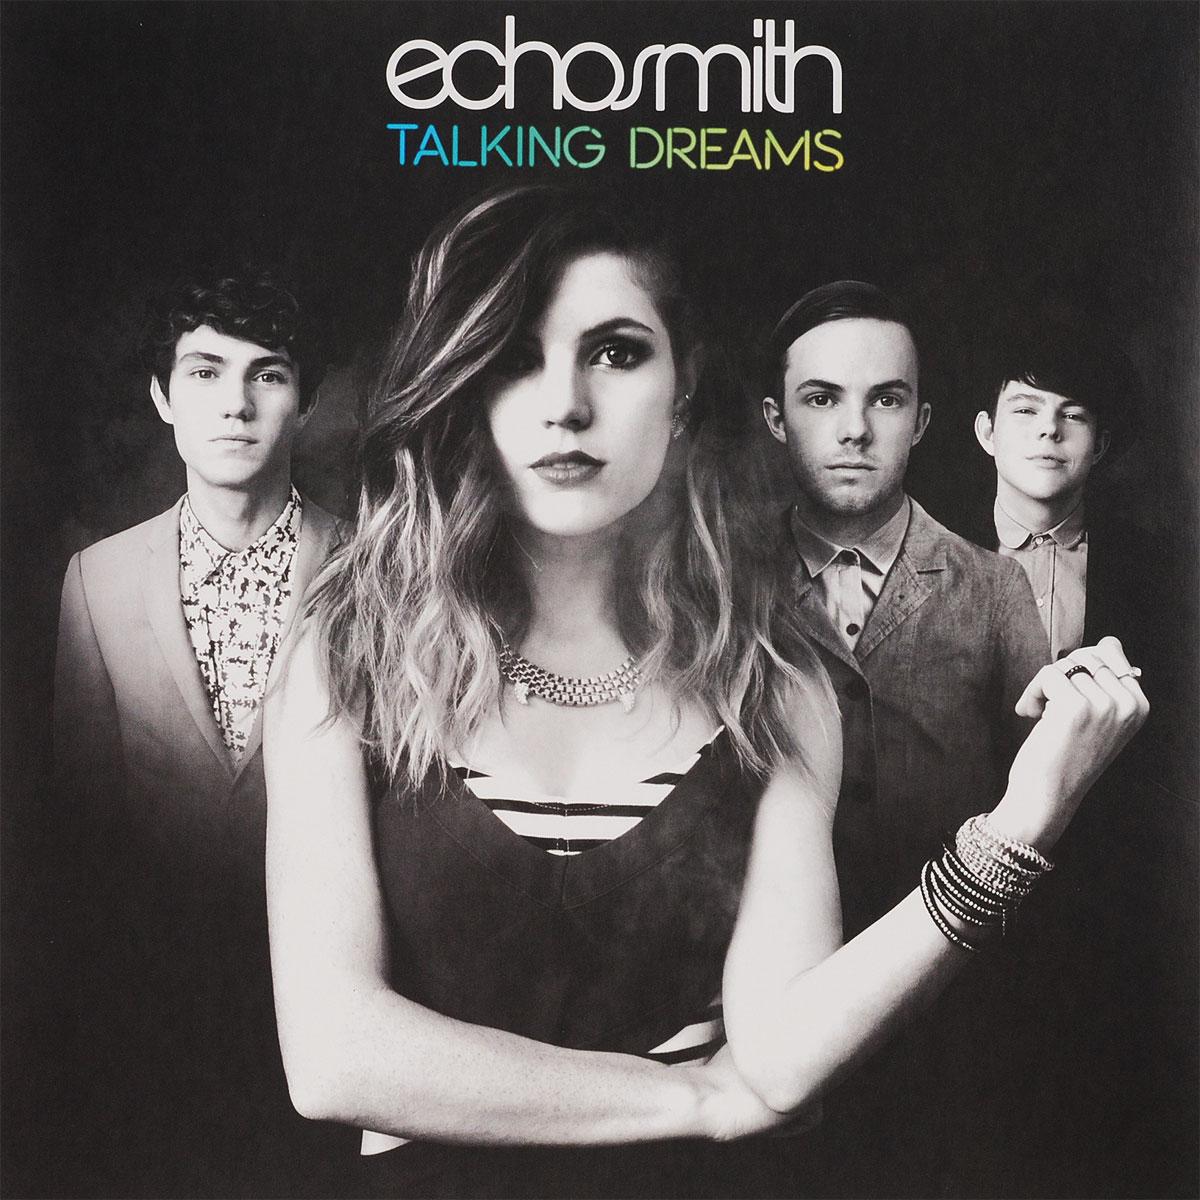 Echosmith TALKING DREAMS malia malia ripples echoes of dreams lp 7